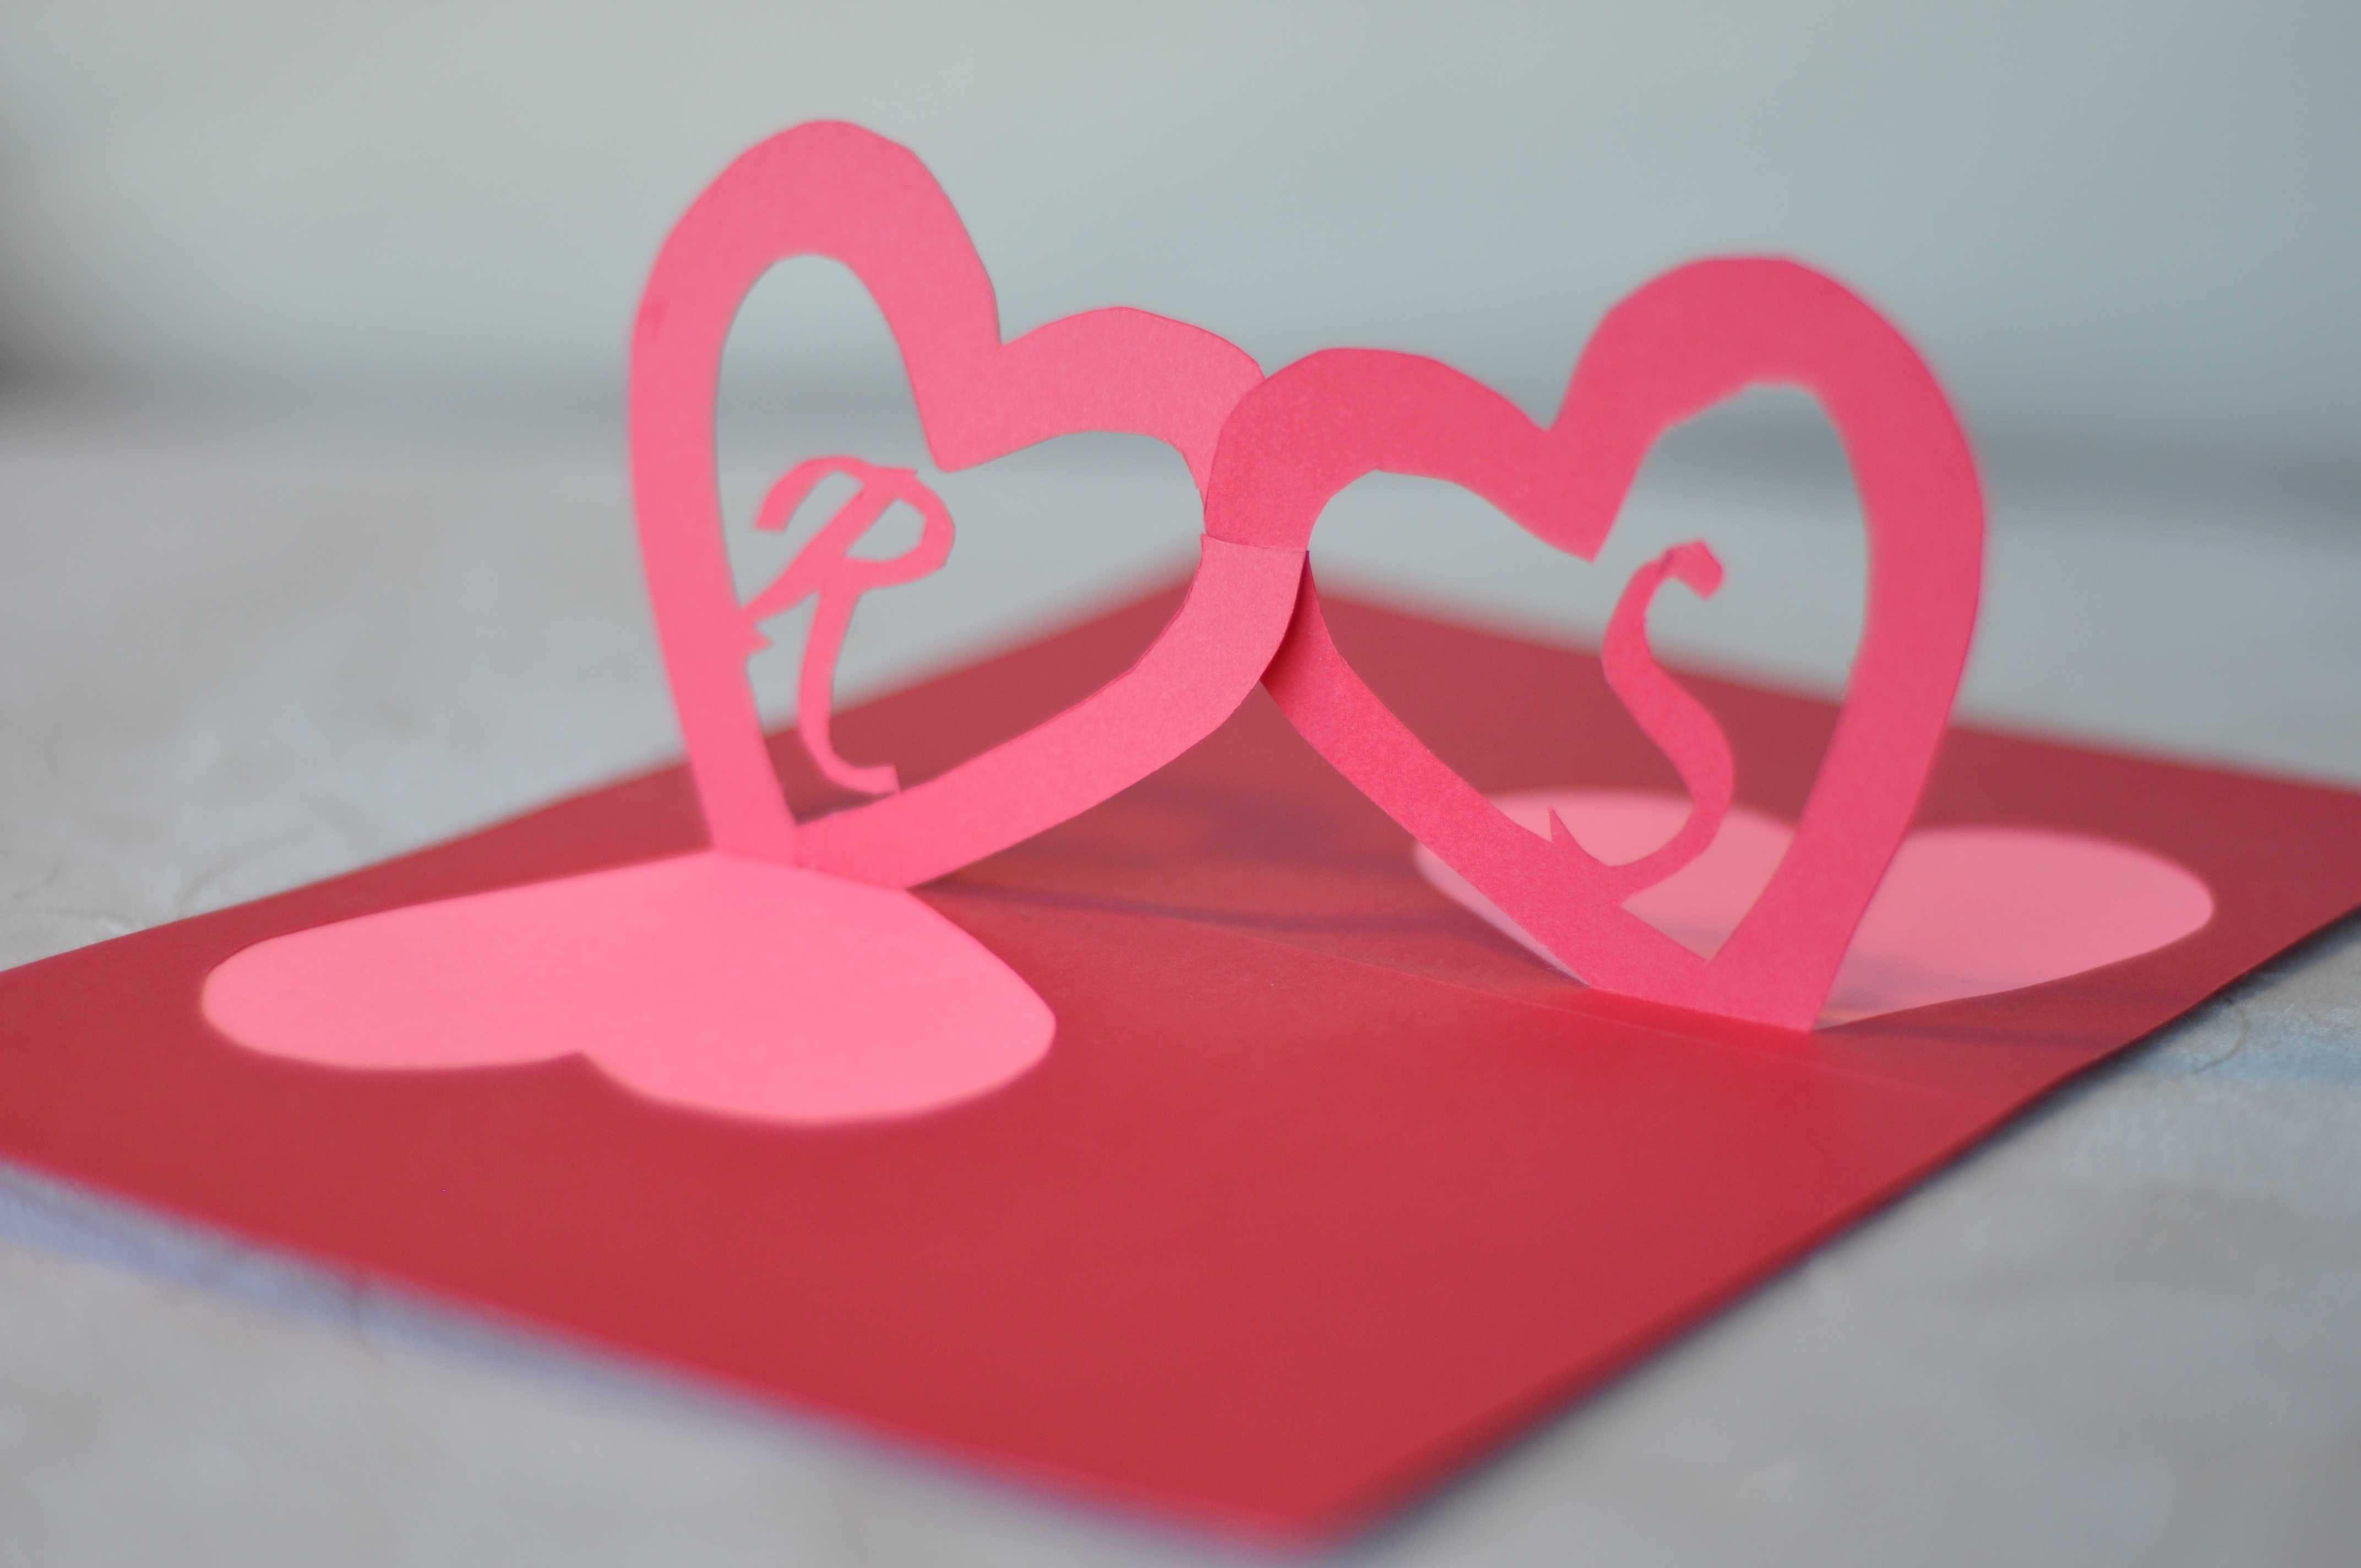 17 Standard Pop Up Card Tutorials And Templates Templates for Pop Up Card Tutorials And Templates